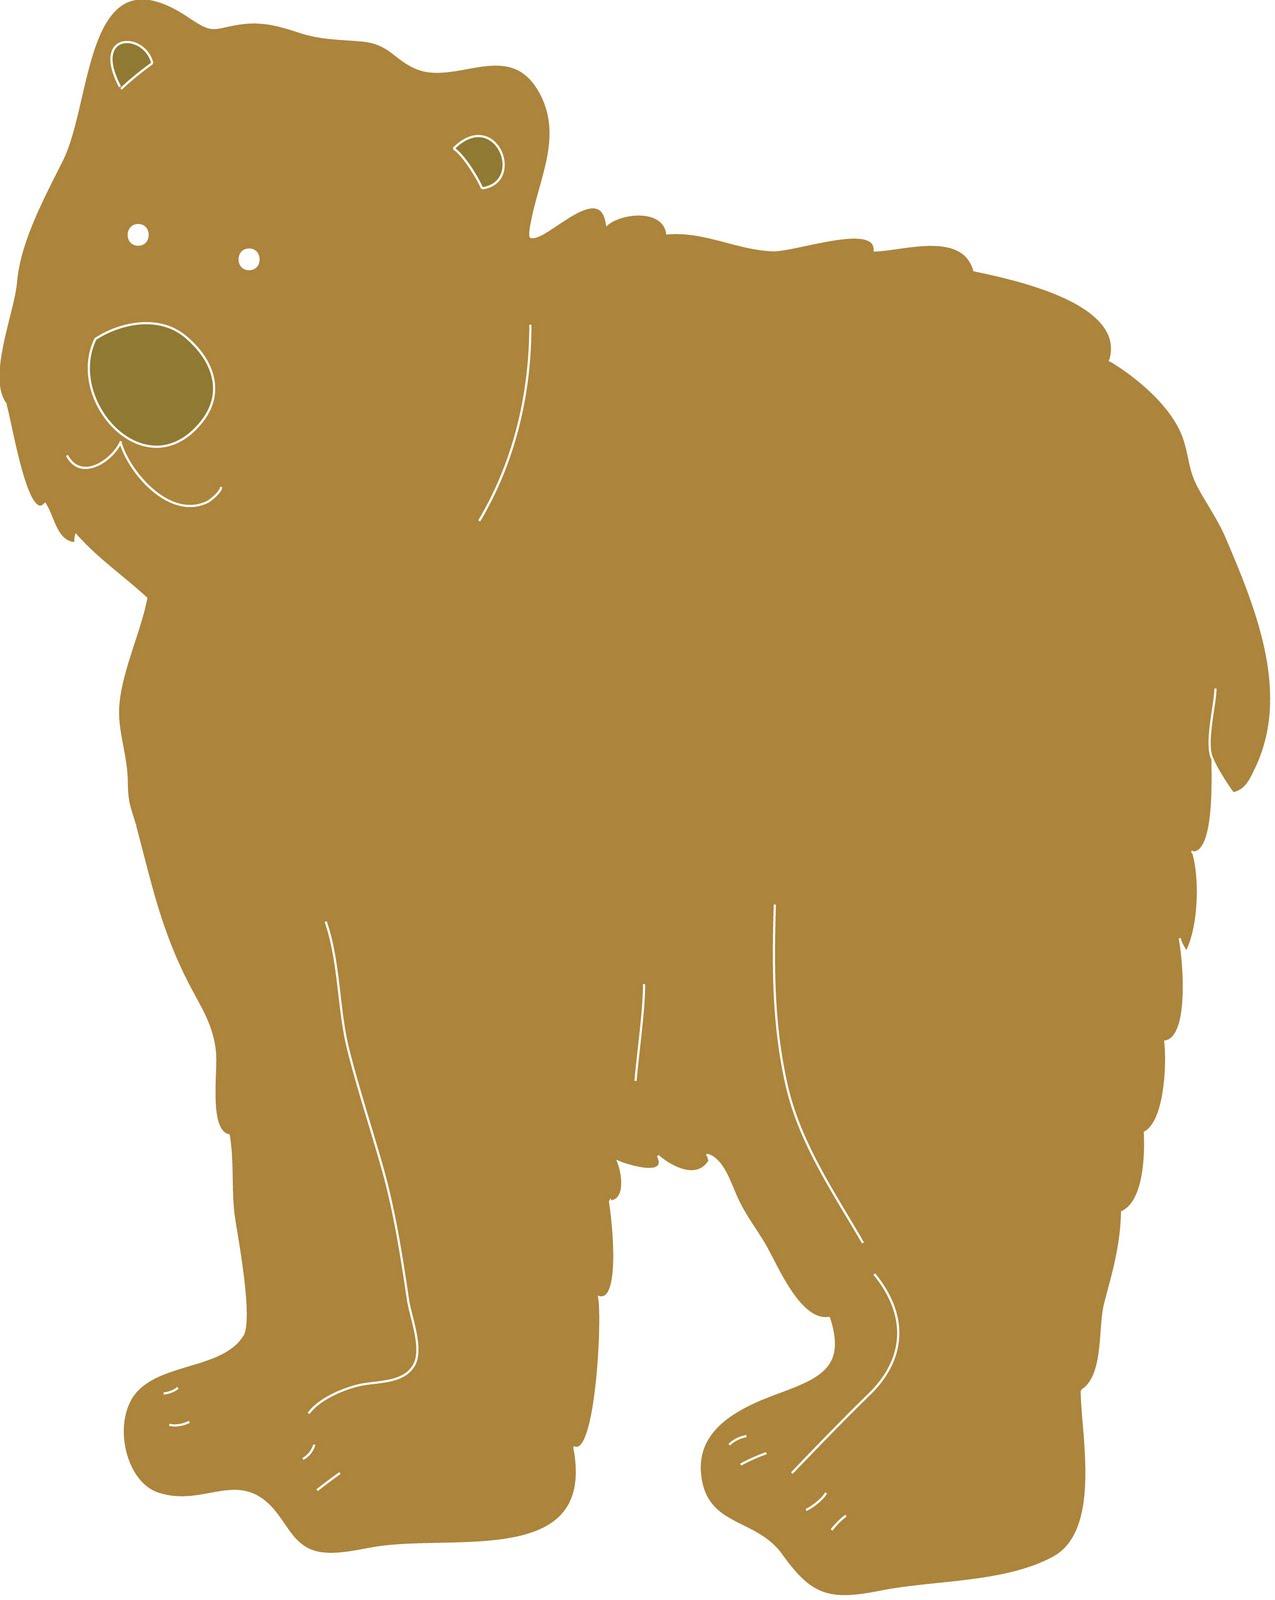 Homeschool Parent Brown Bear Brown Bear What Do You See